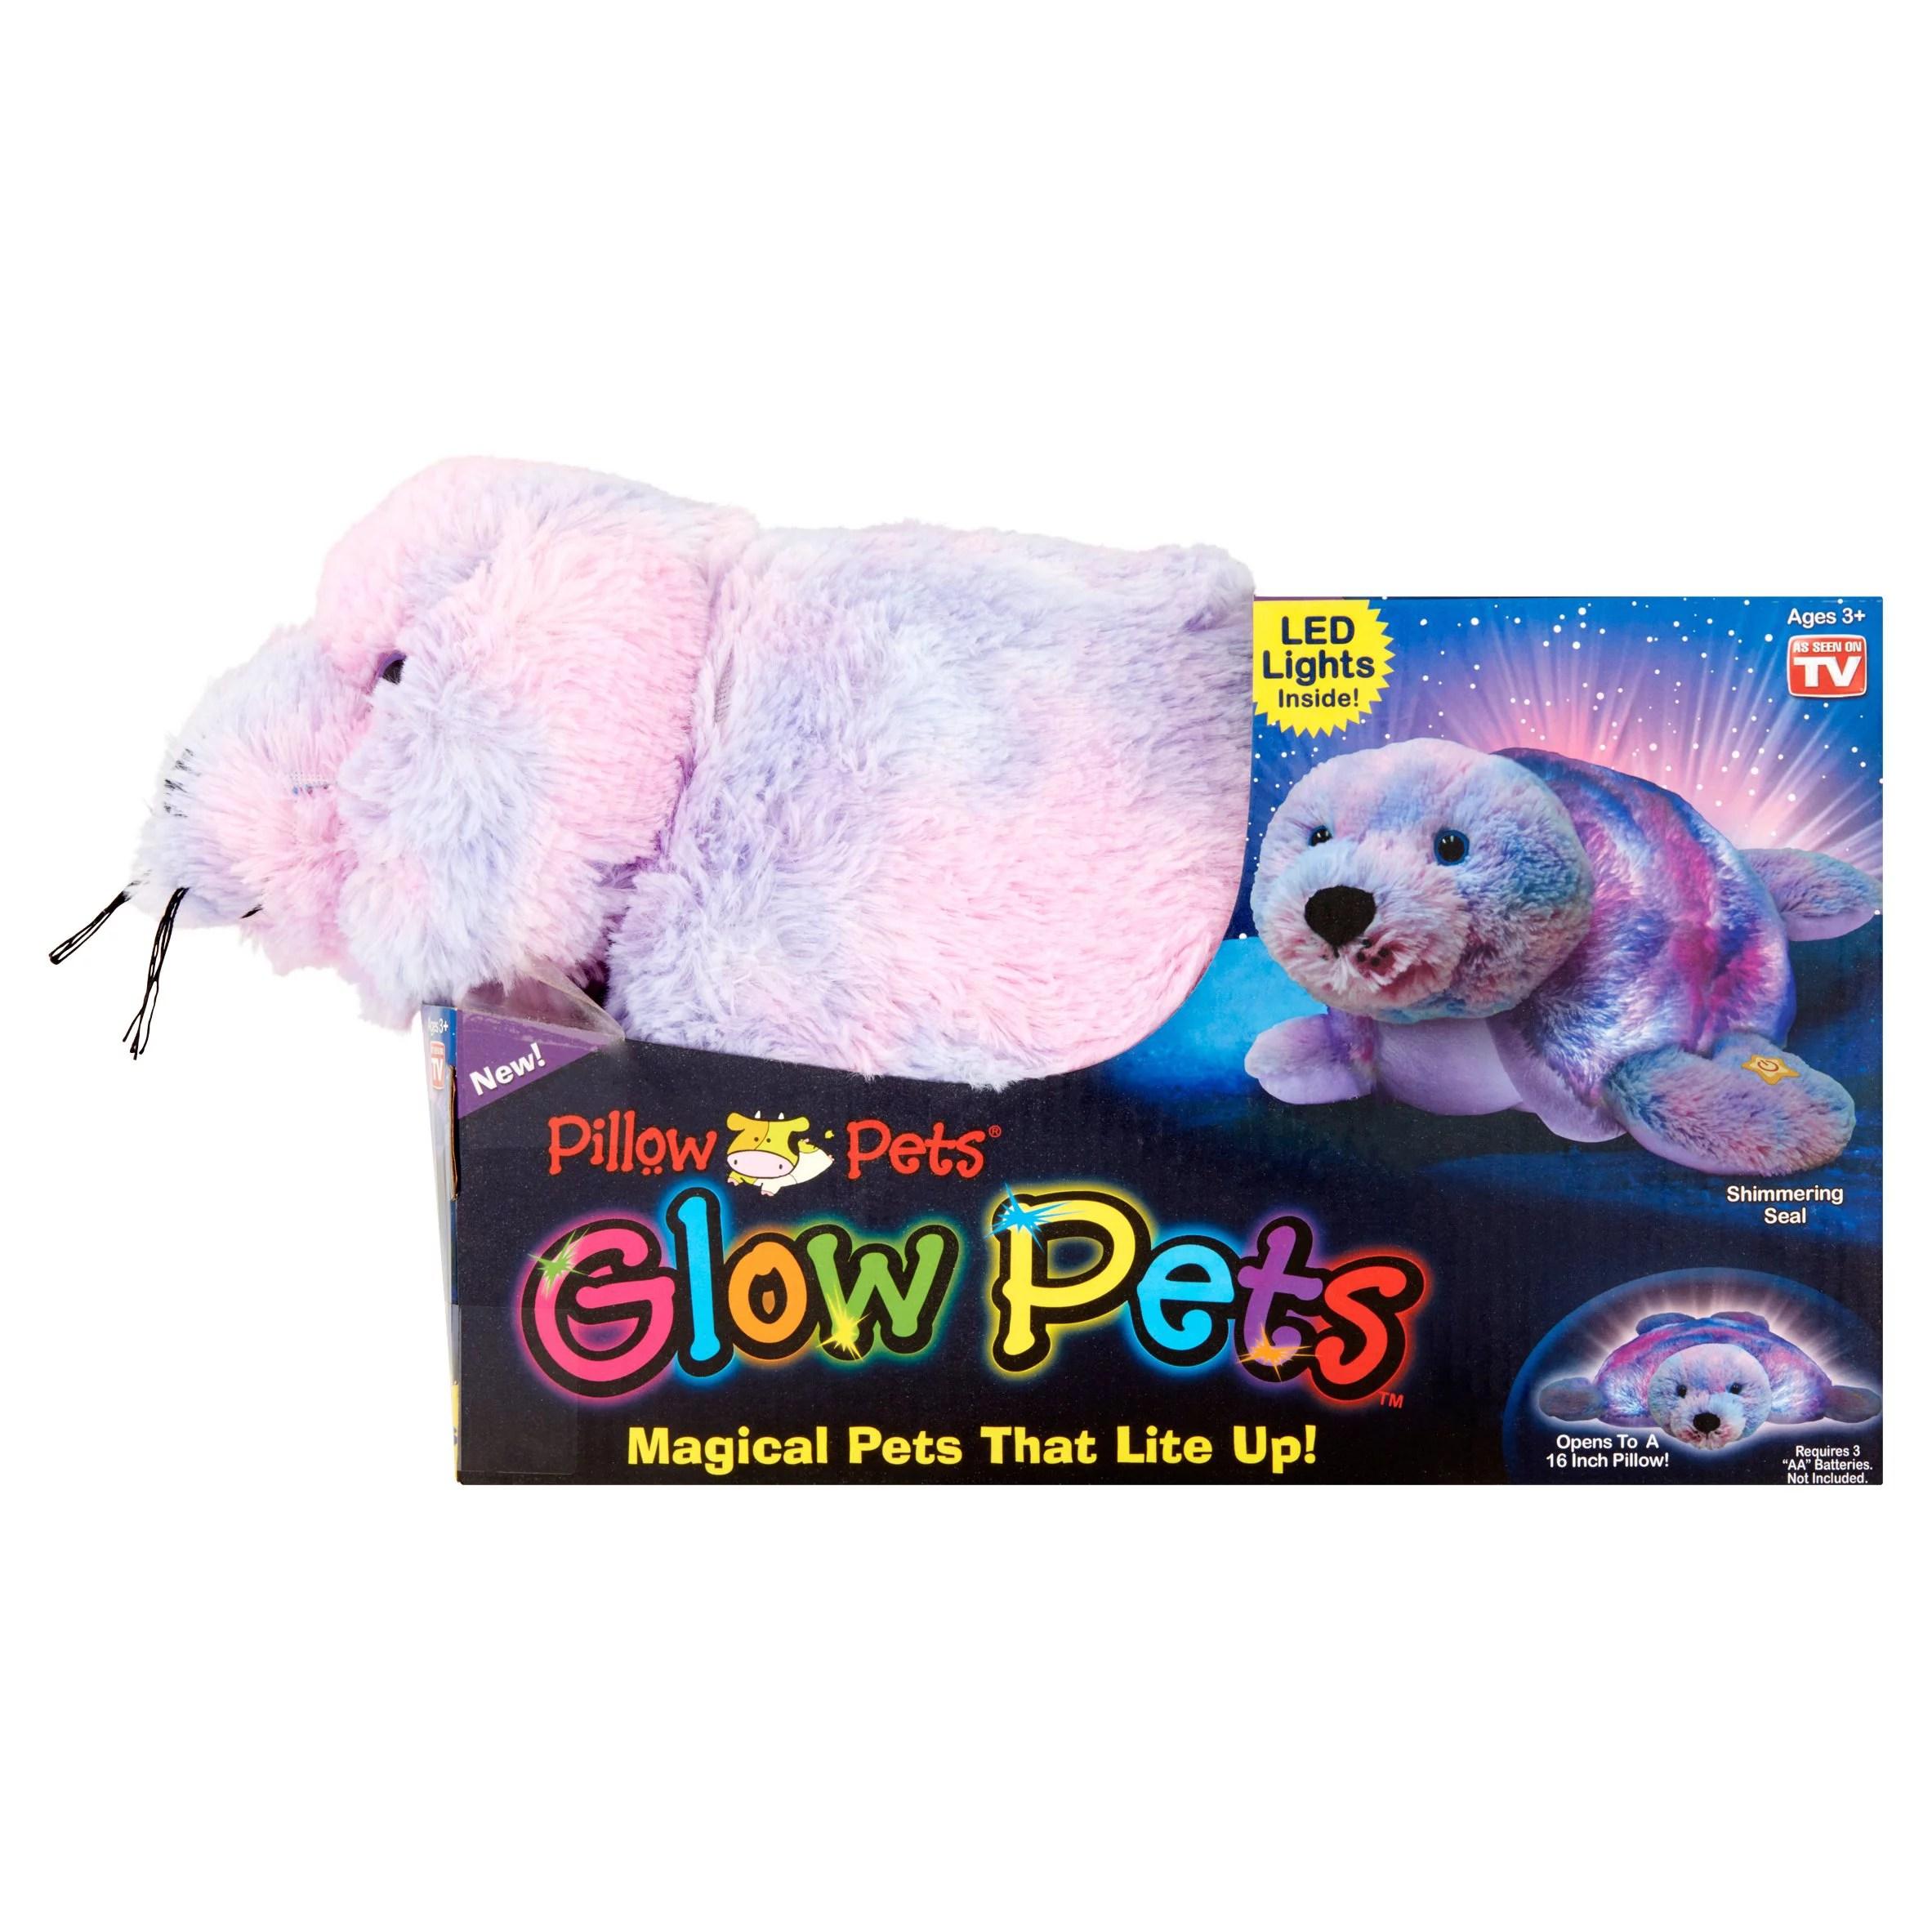 pillow pets shimmering seal glow pets walmart com